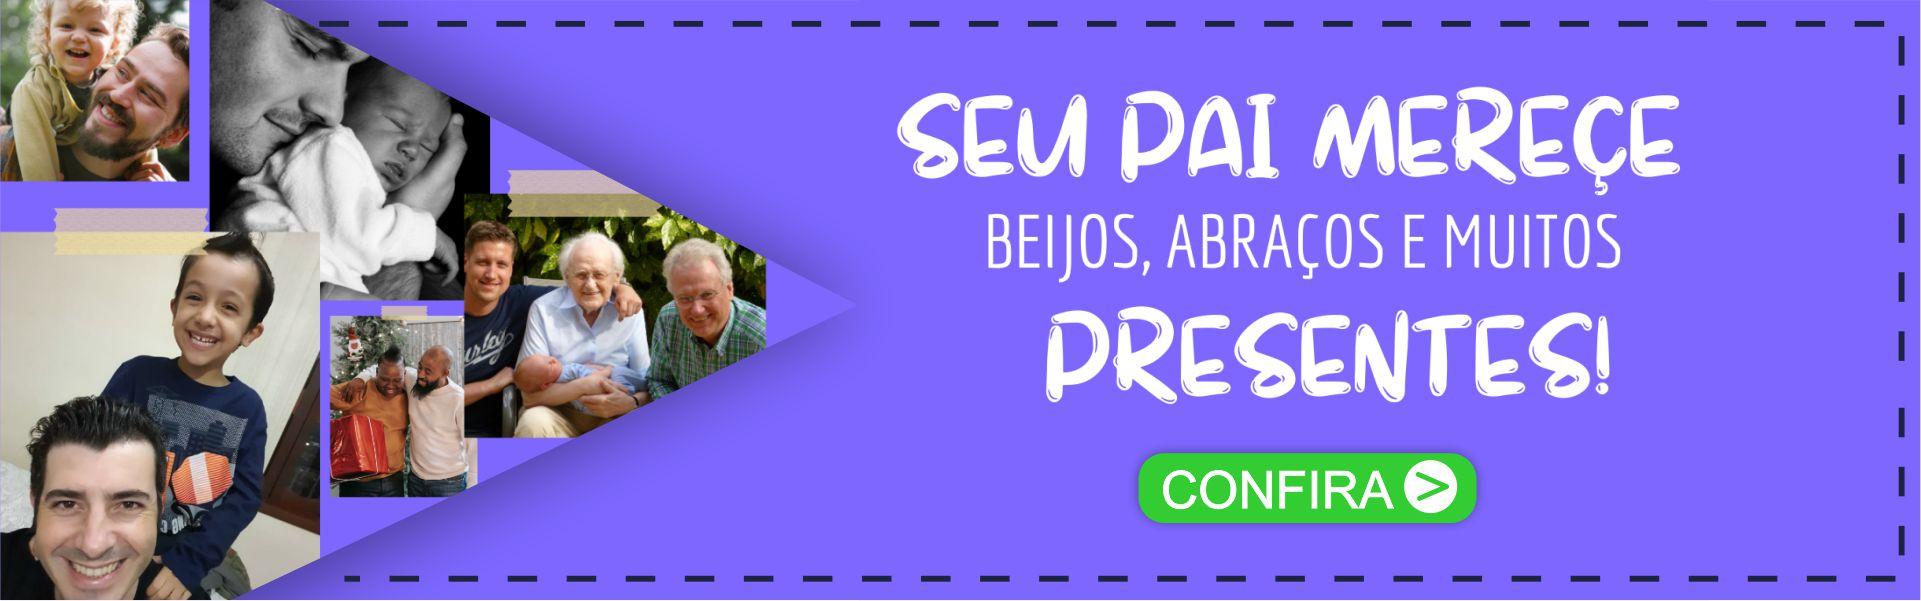 CONFIRA OS LINDOS PRESENTES PARA O PAPAI